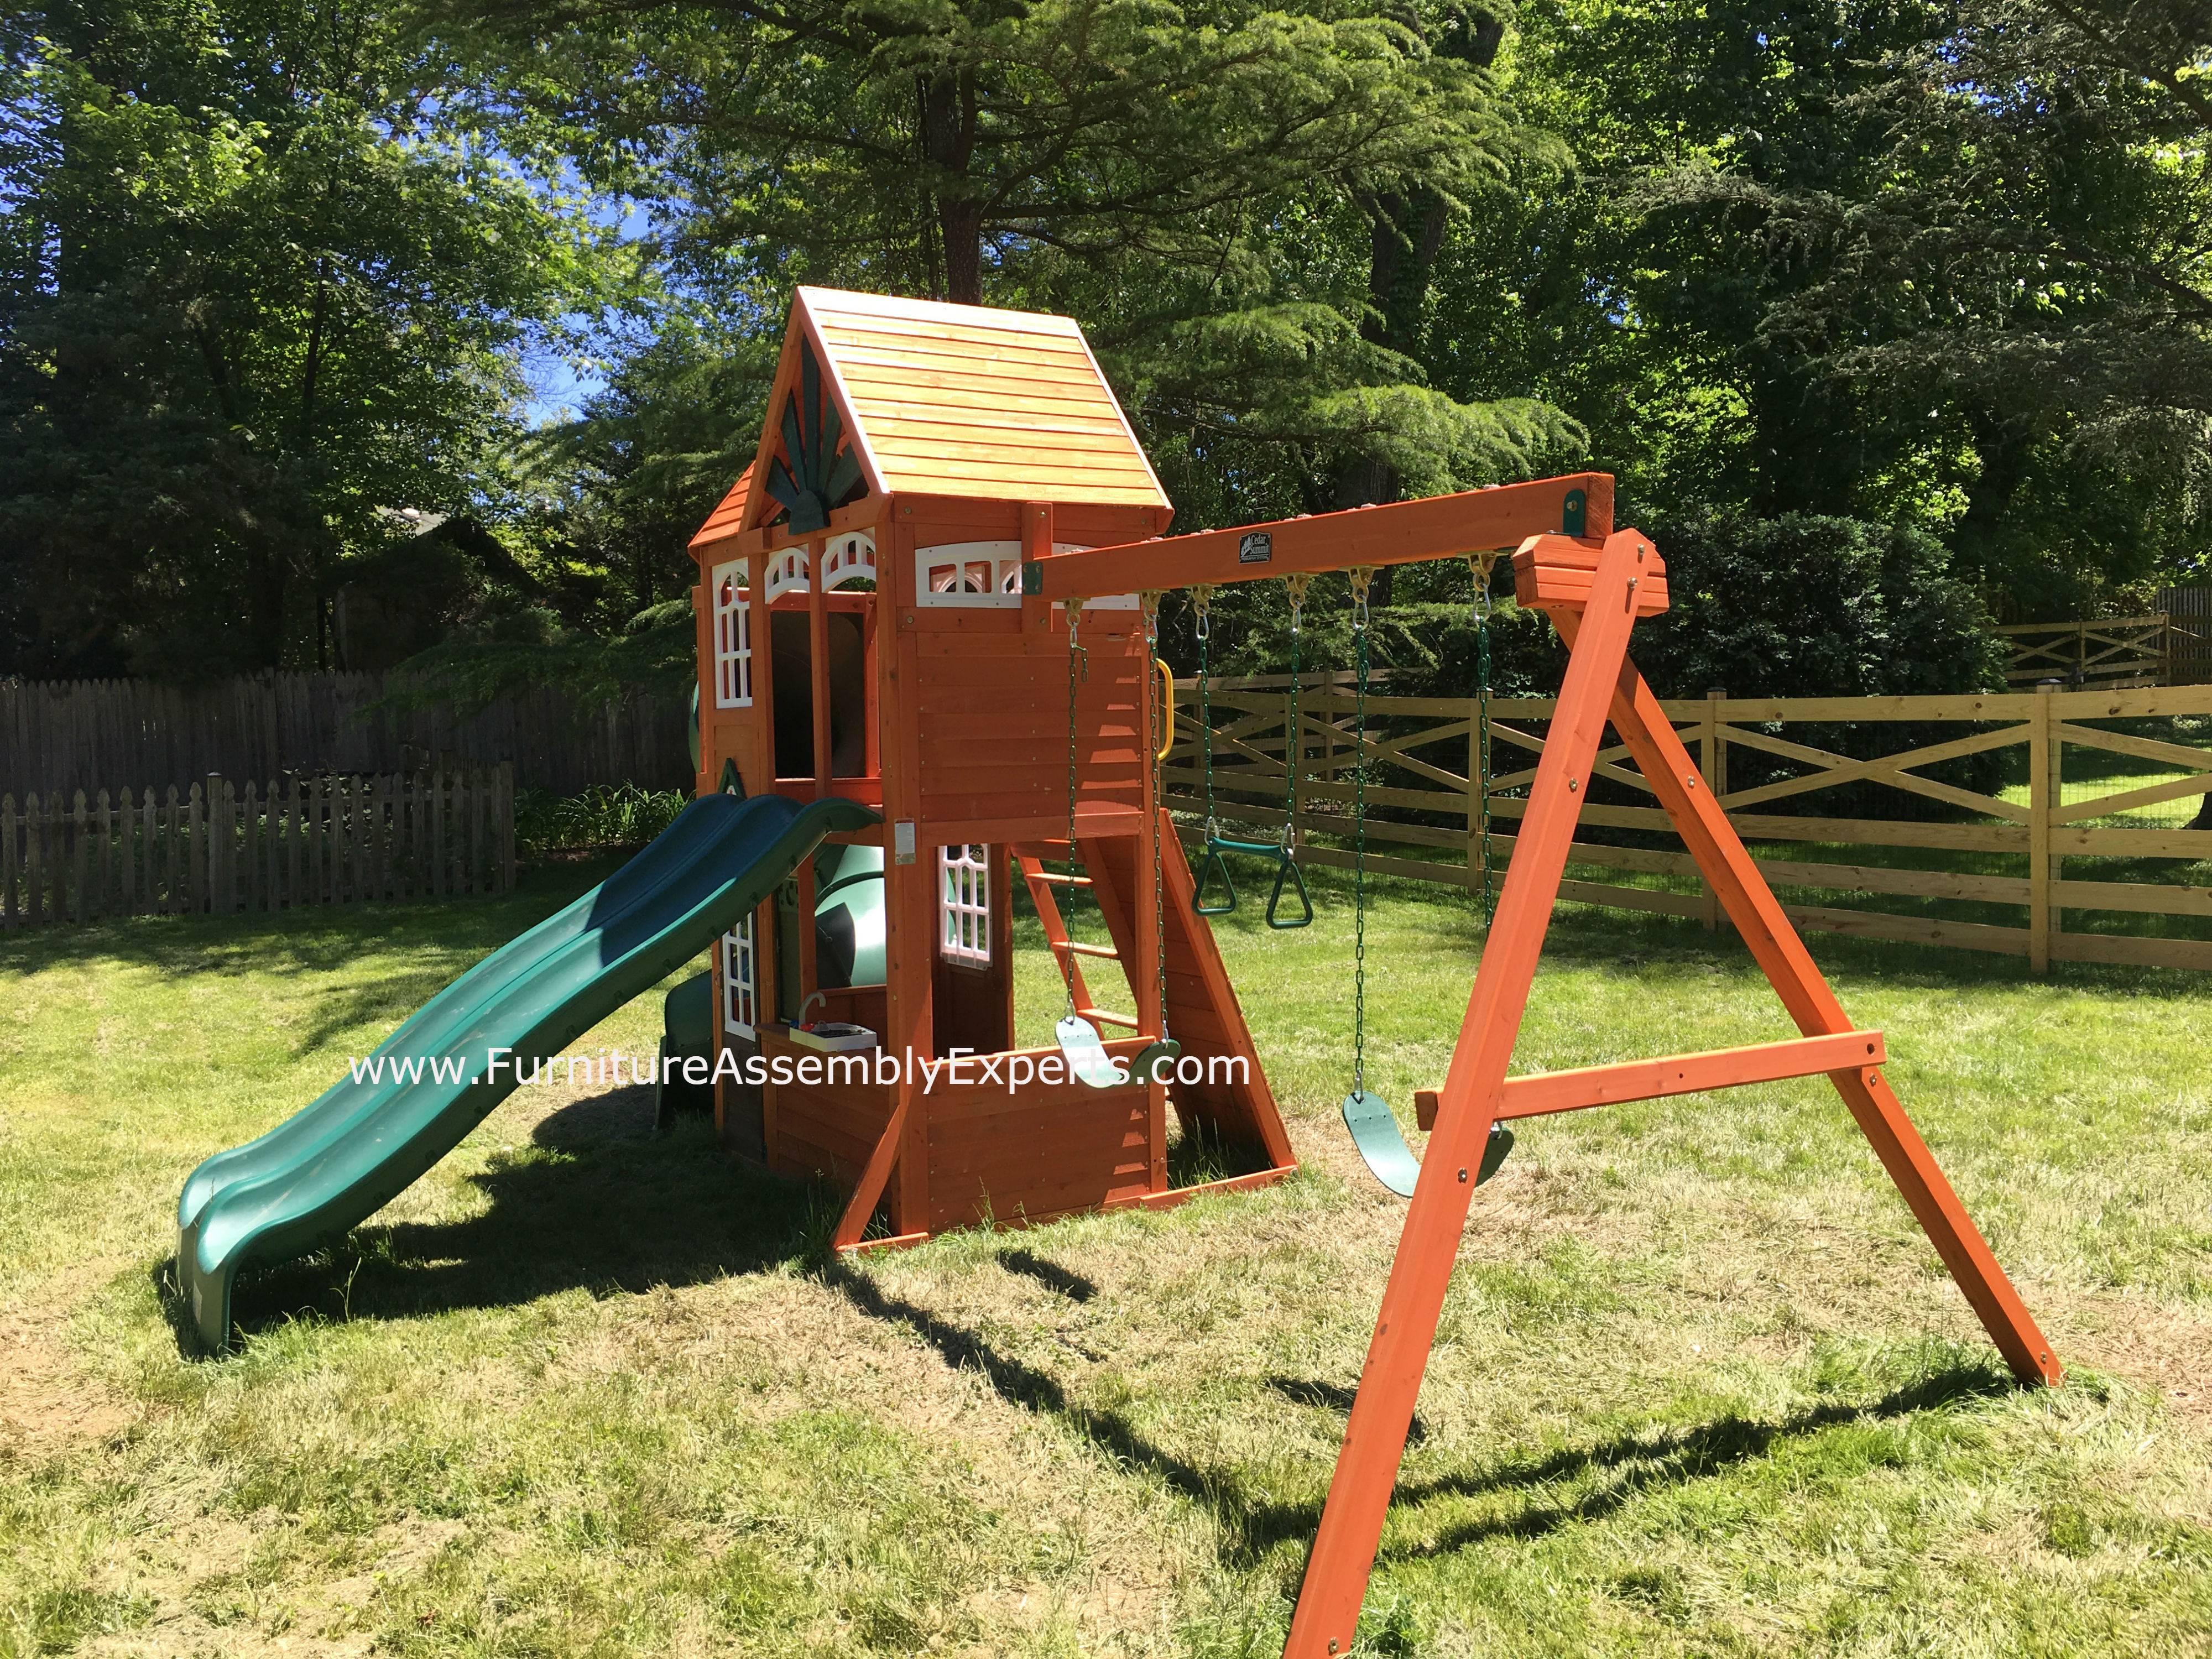 Cedar Summit Valleyview Deluxe Playset installation in Herndon Virginia